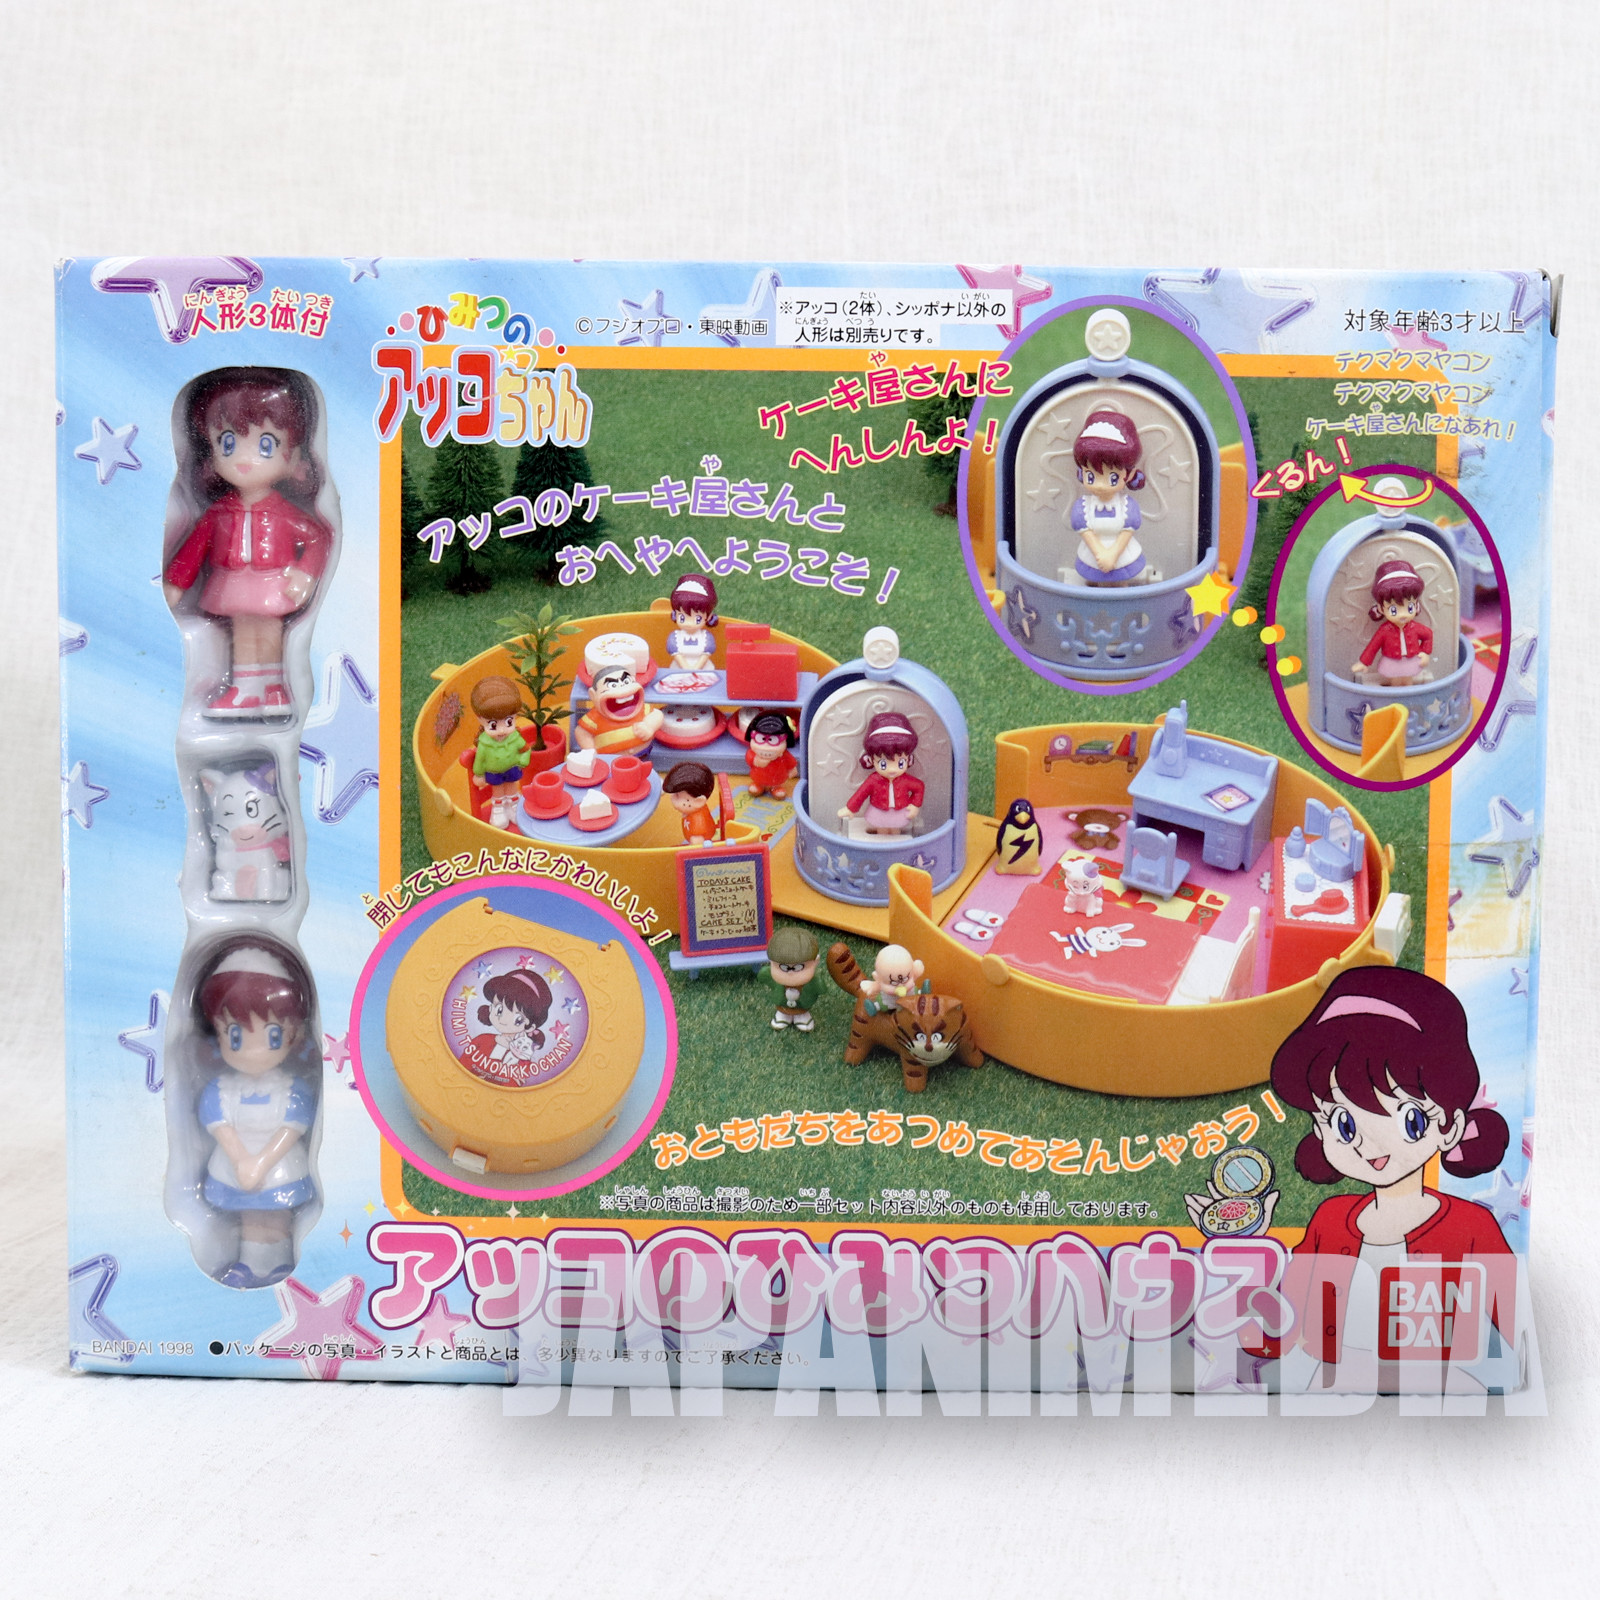 Himitsu no Akko chan's Secret House Figure BANDAI JAPAN ANIME